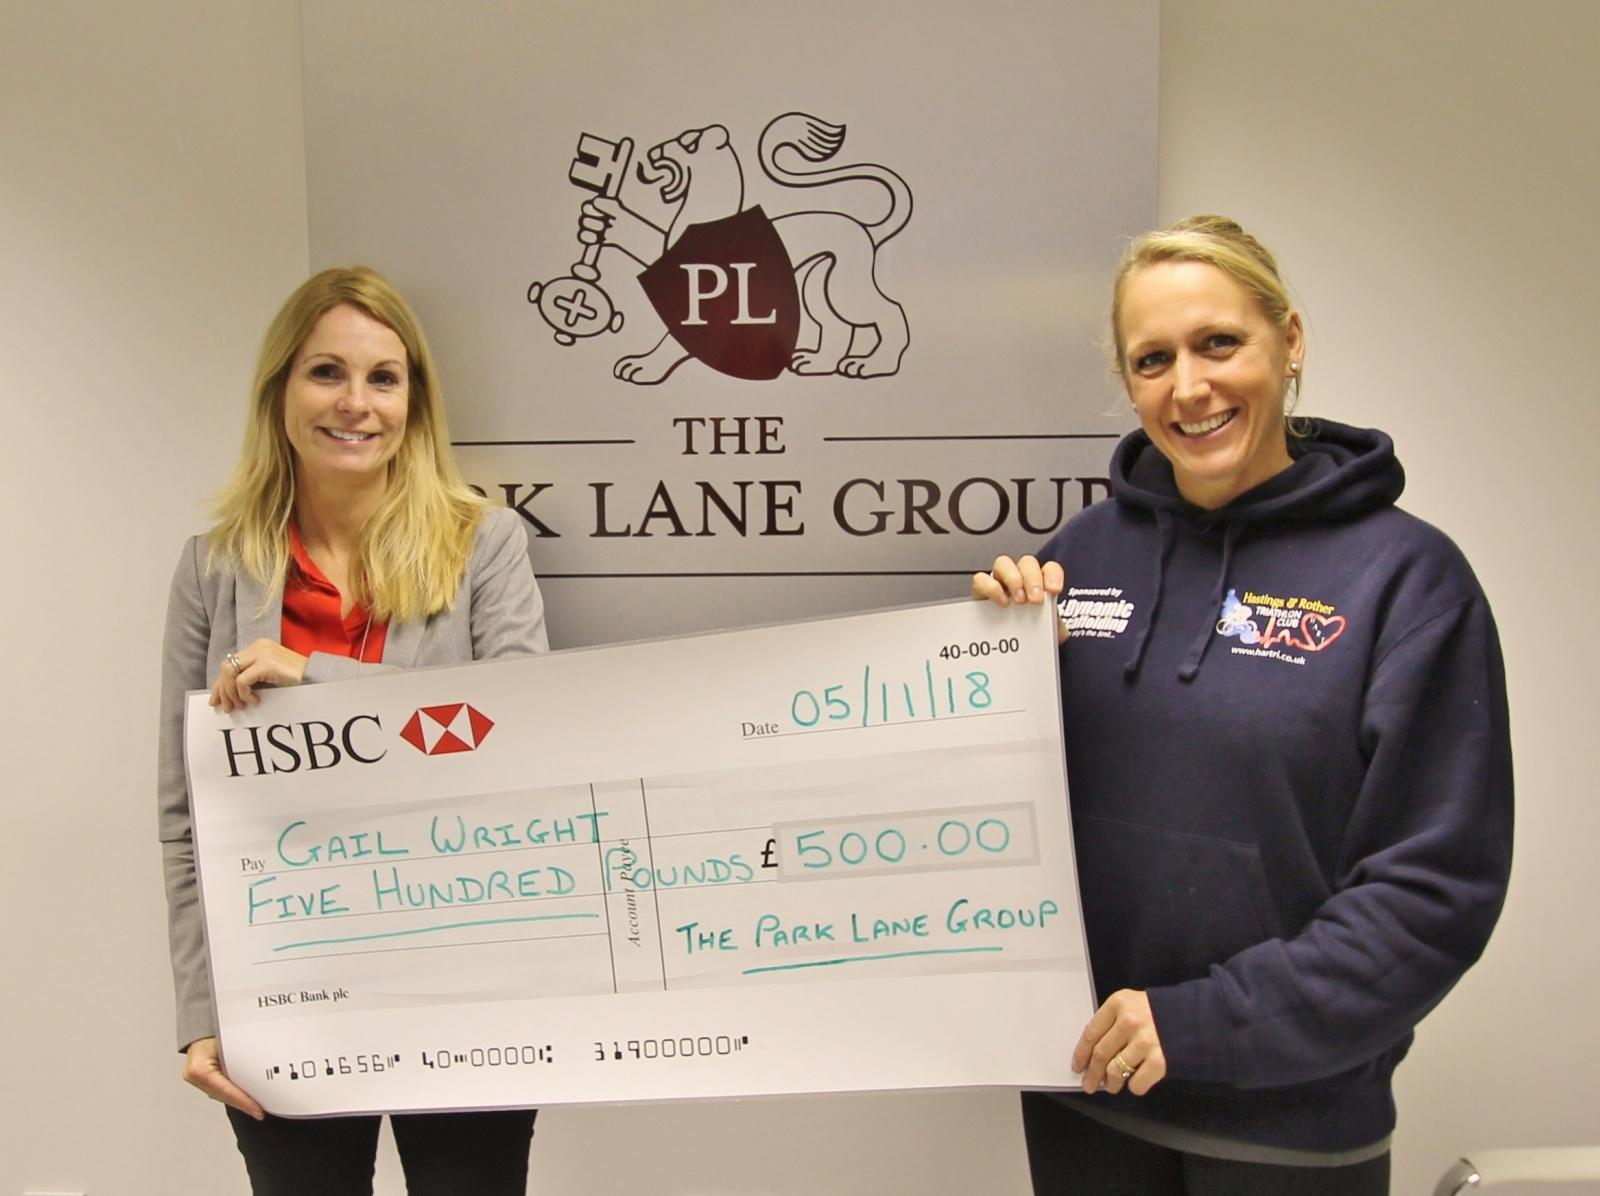 Gail Wright Athlete sponsorship by The Park Lane Group